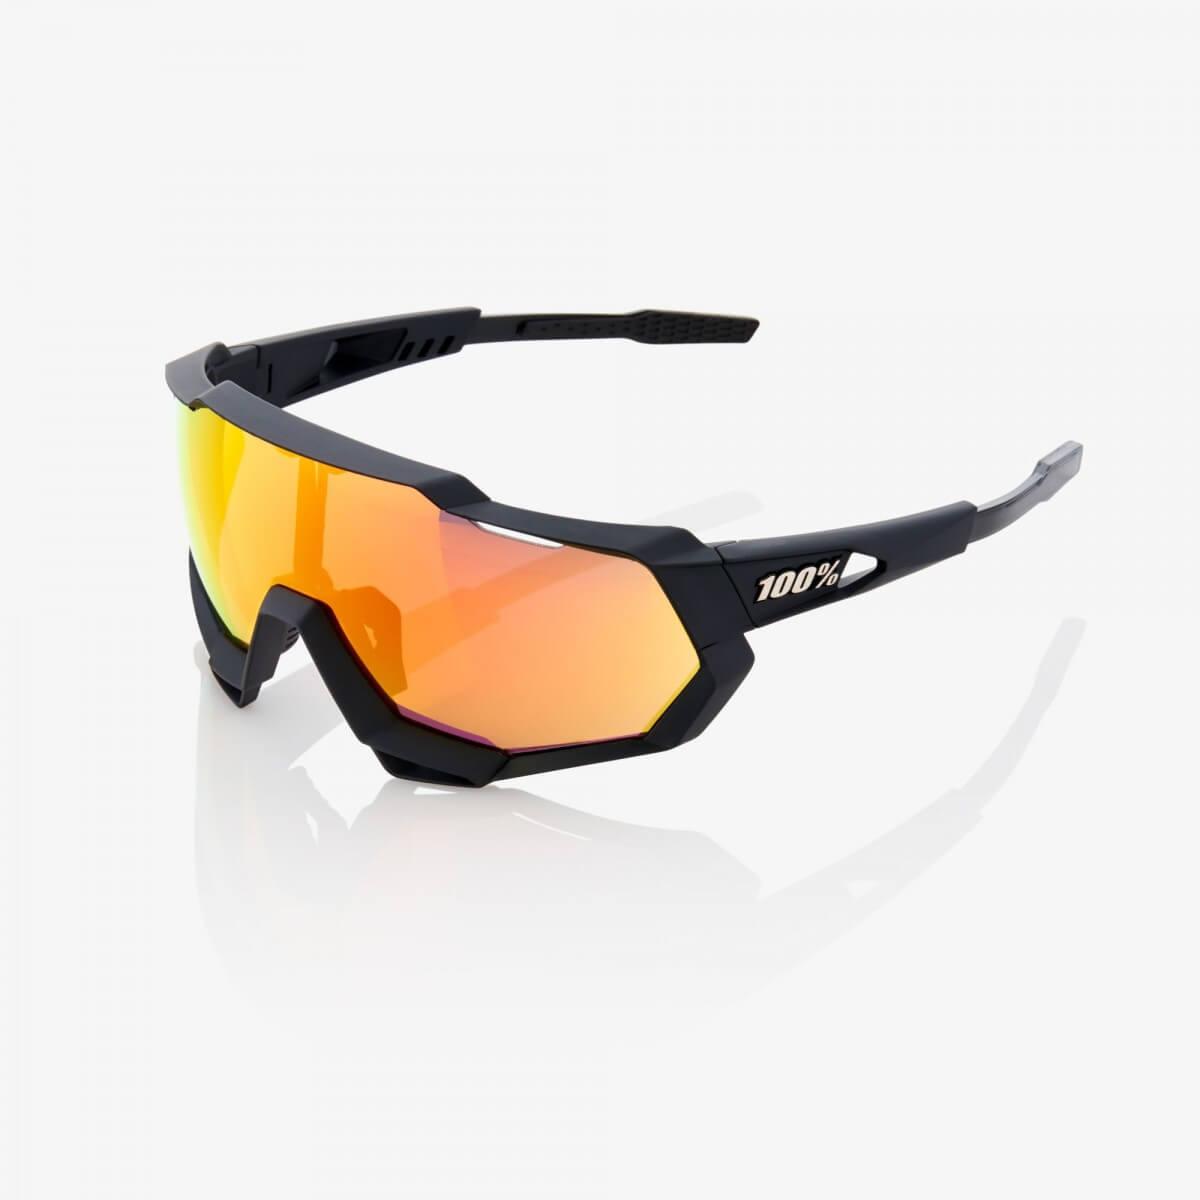 74ccb66d73 Gafas 100% Speedtrap soft tact negro/ lente espejo roja hd multilayer